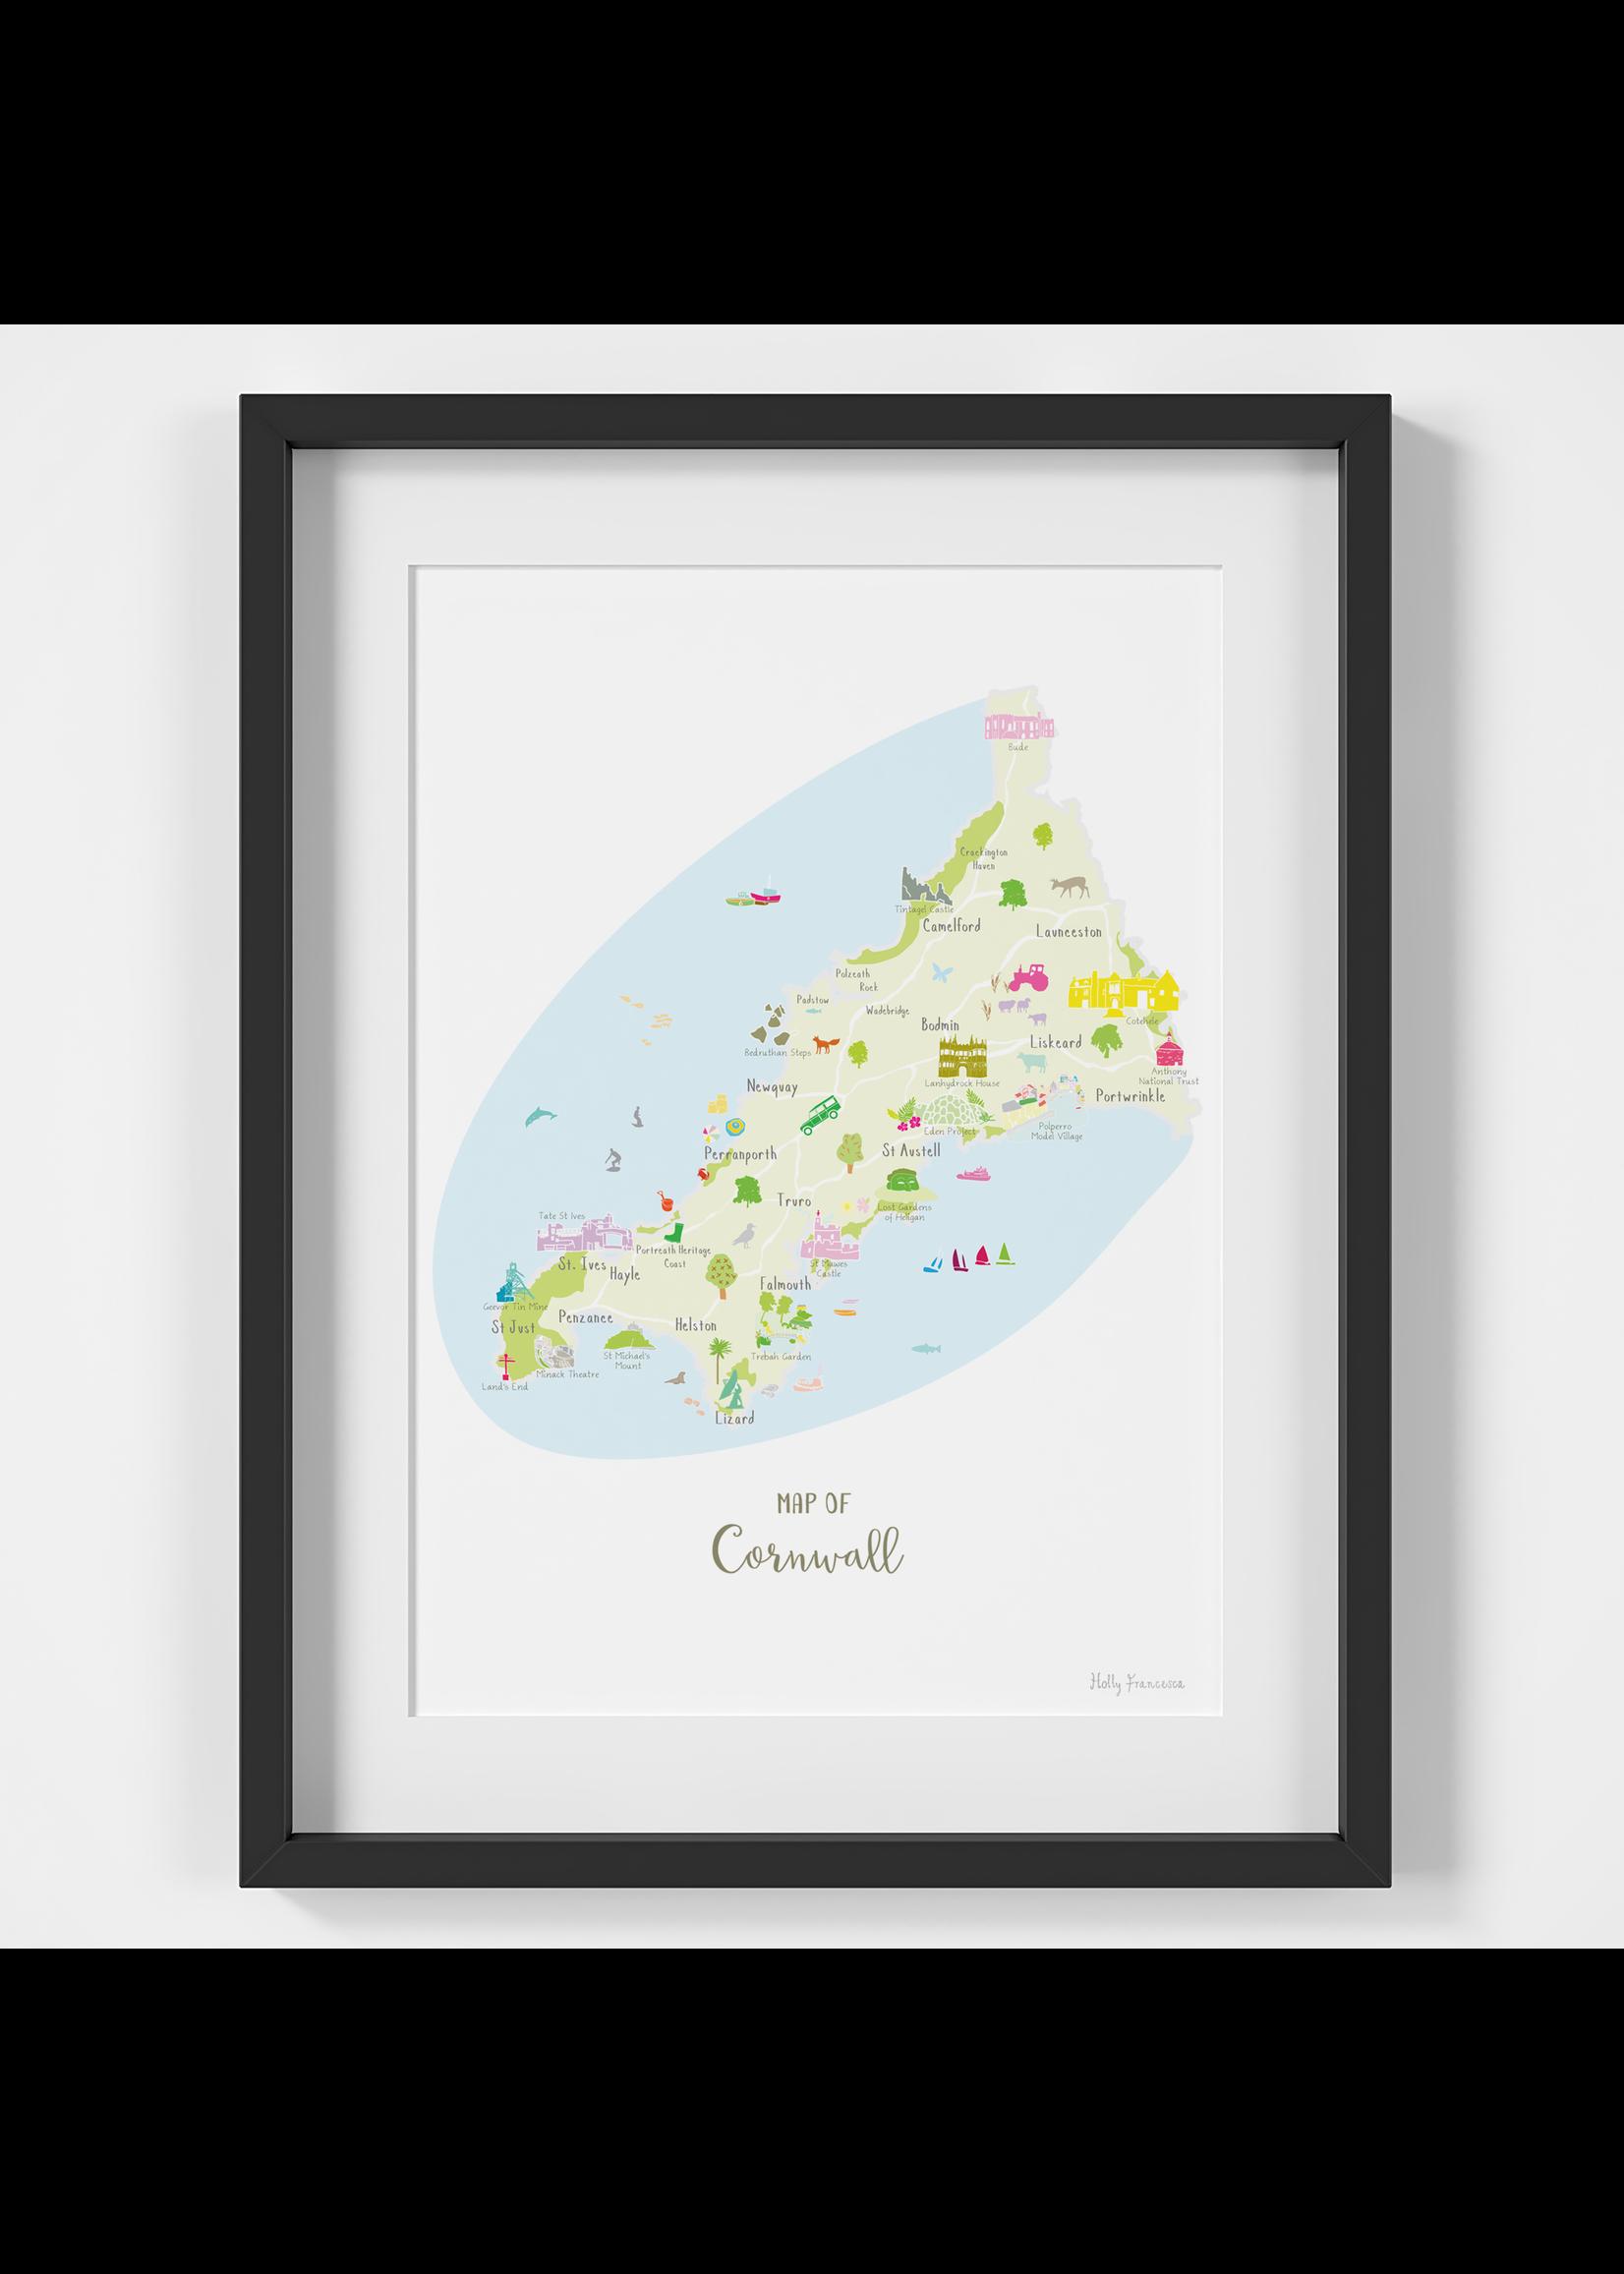 Holly Francesca Holly Francesca Map of Cornwall A4